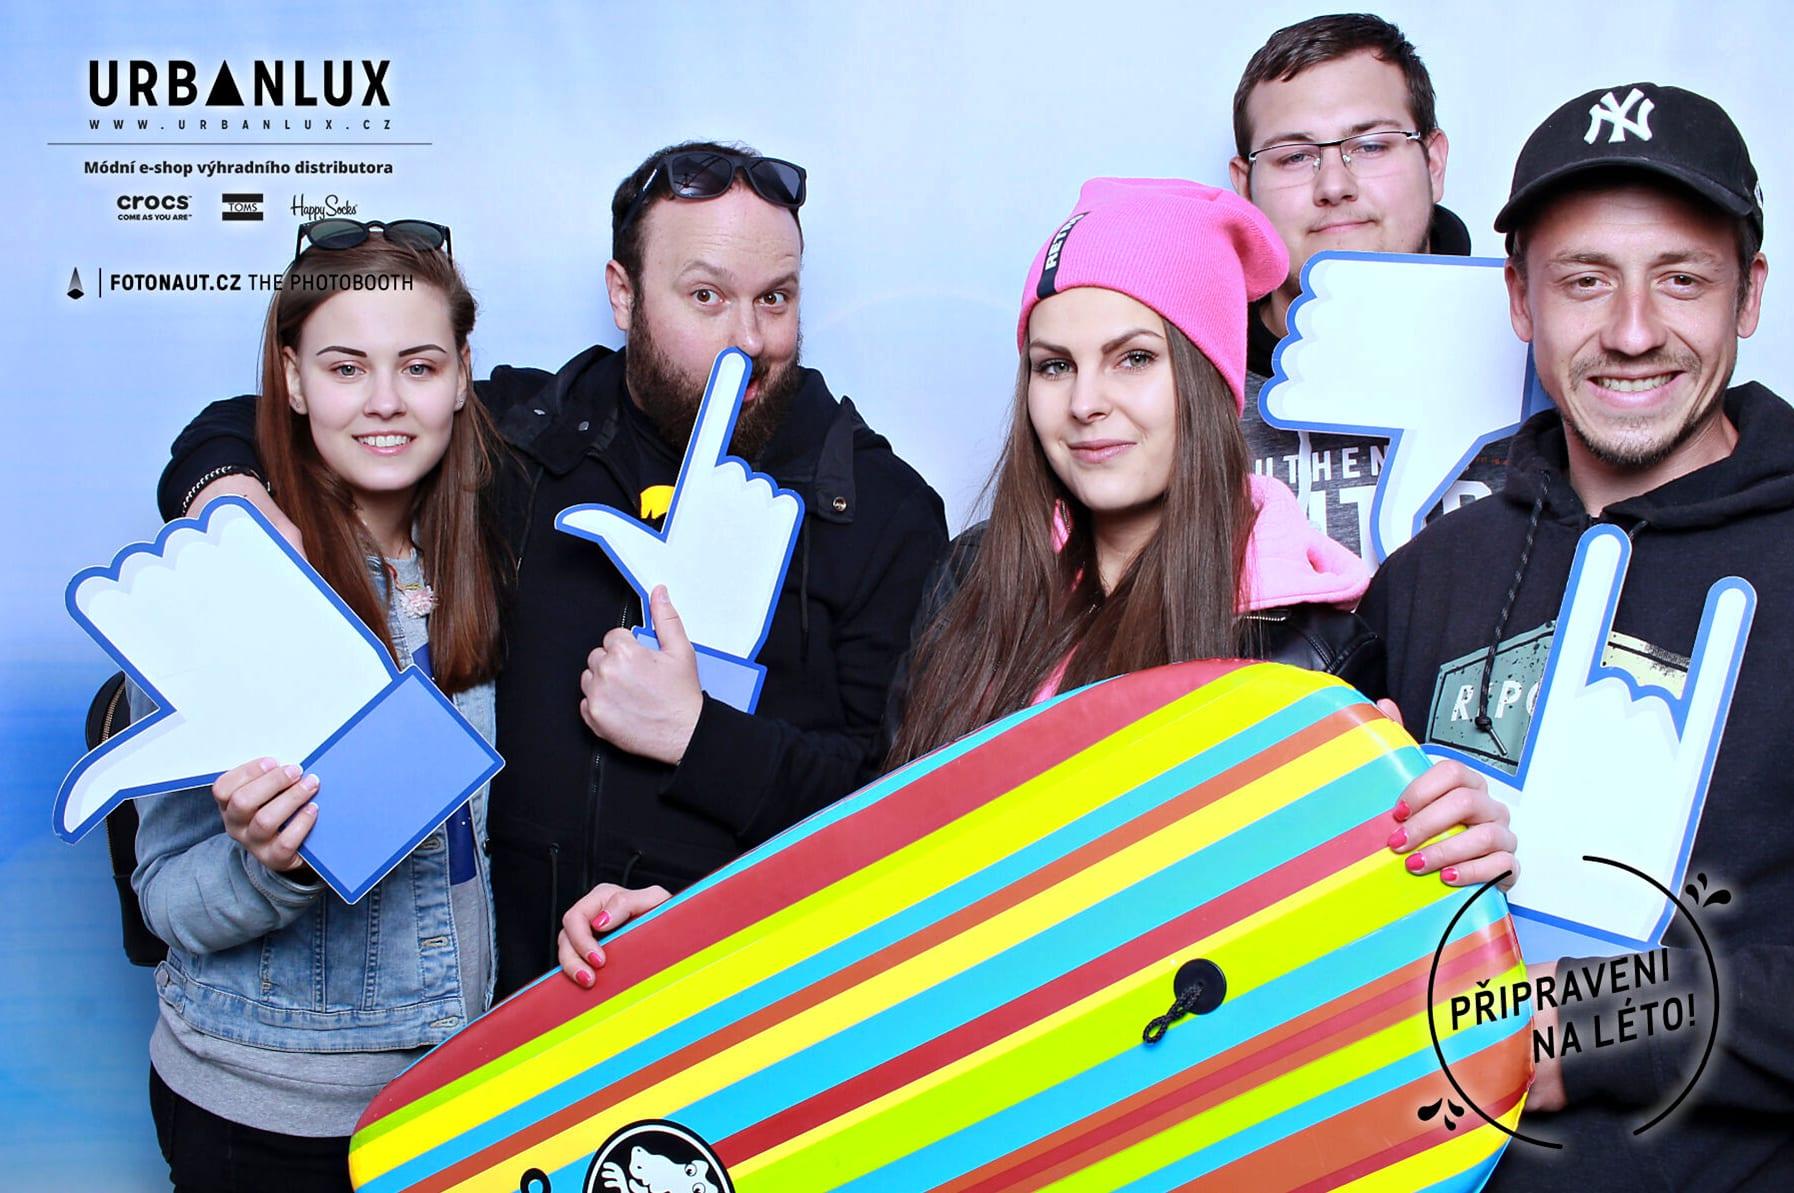 fotokoutek-urbanlux-27-4-2019-598272